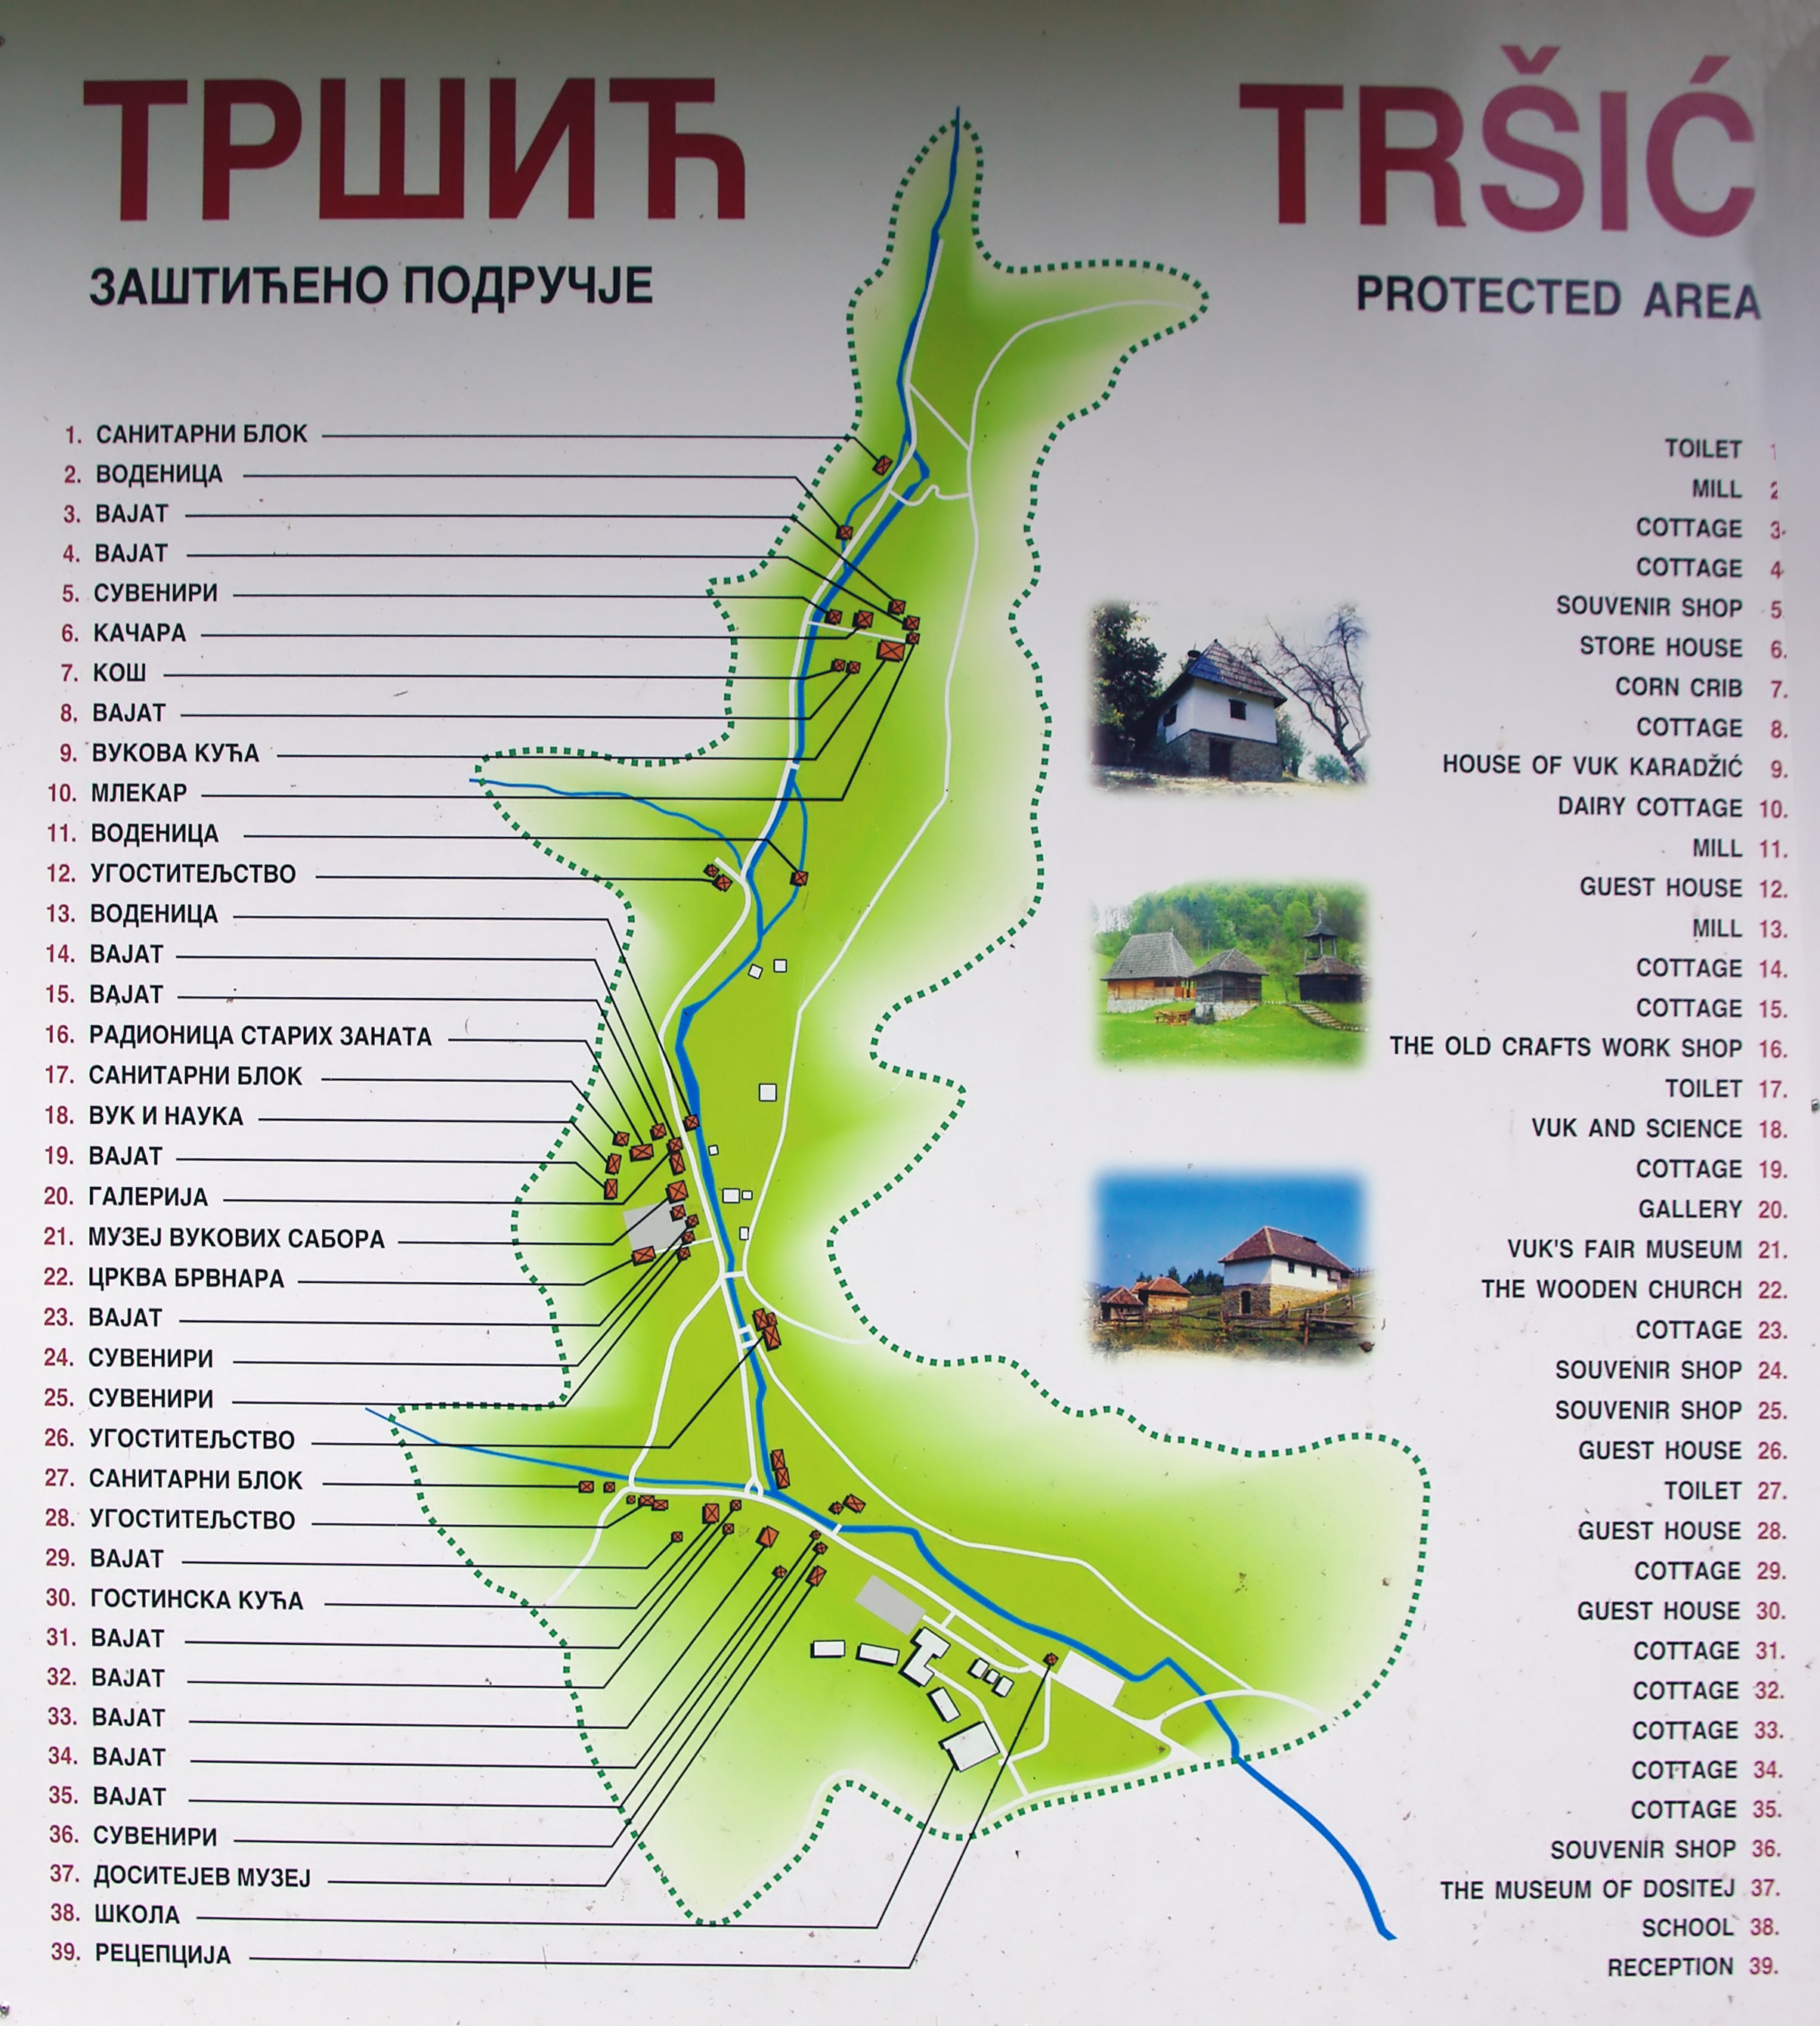 trsic mapa پرونده:Tršić information table.   ویکیپدیا، دانشنامهٔ آزاد trsic mapa